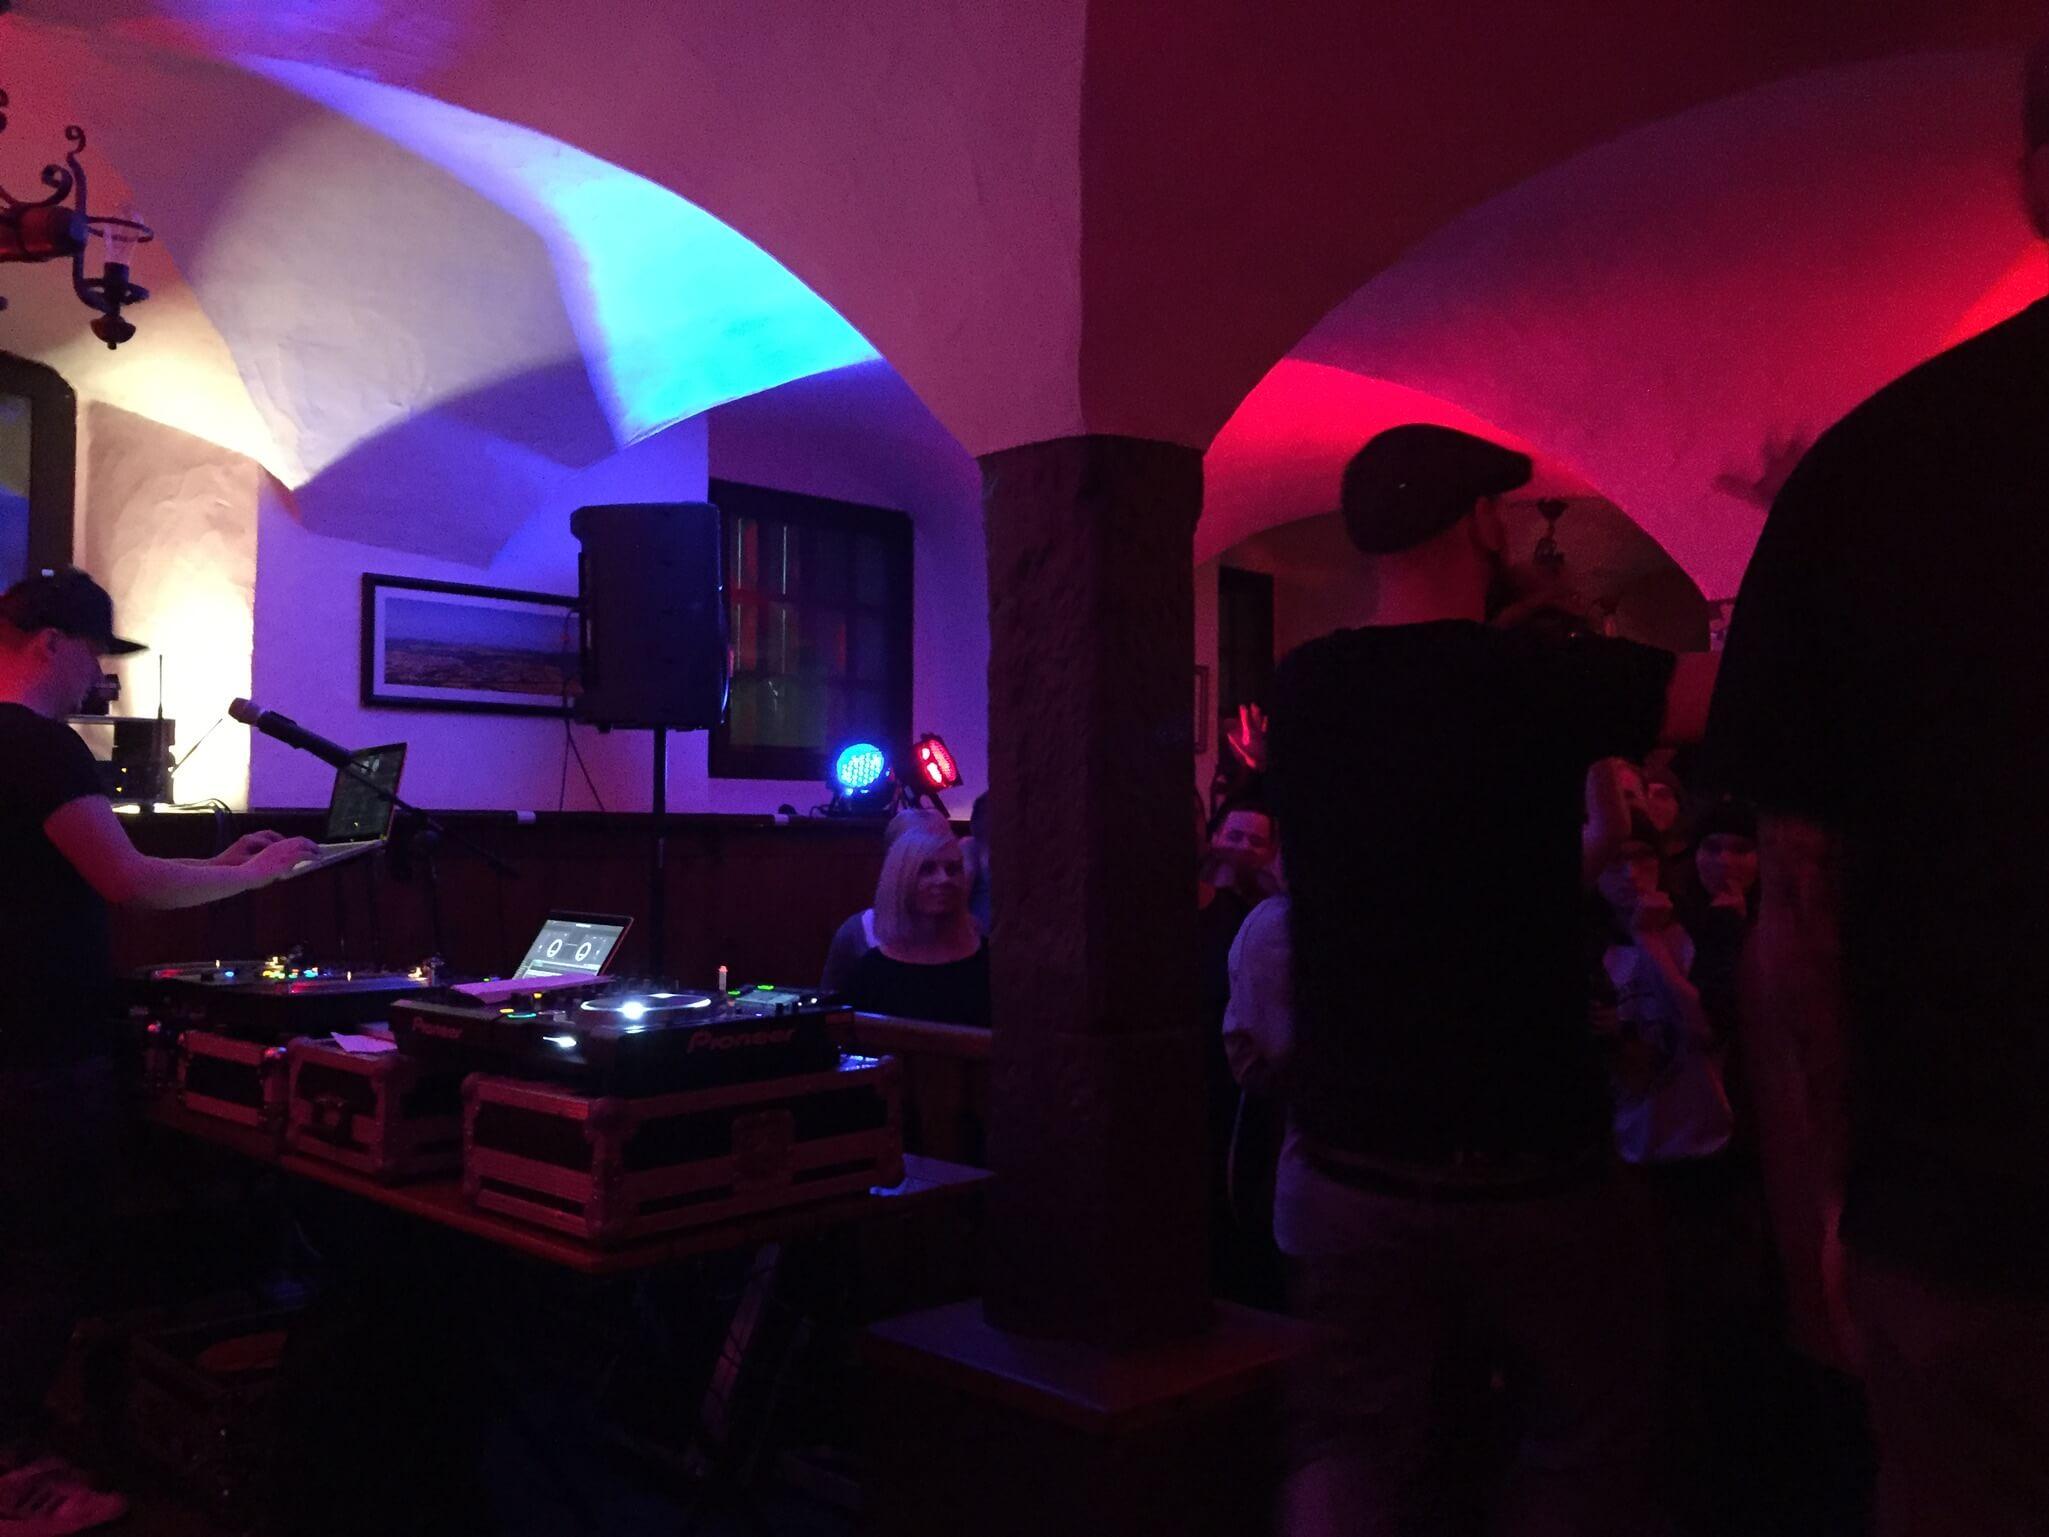 Stageview 4. Company Slow. Frankenburger. Live Hip Hop. Bratwurst Rap. Coburg.